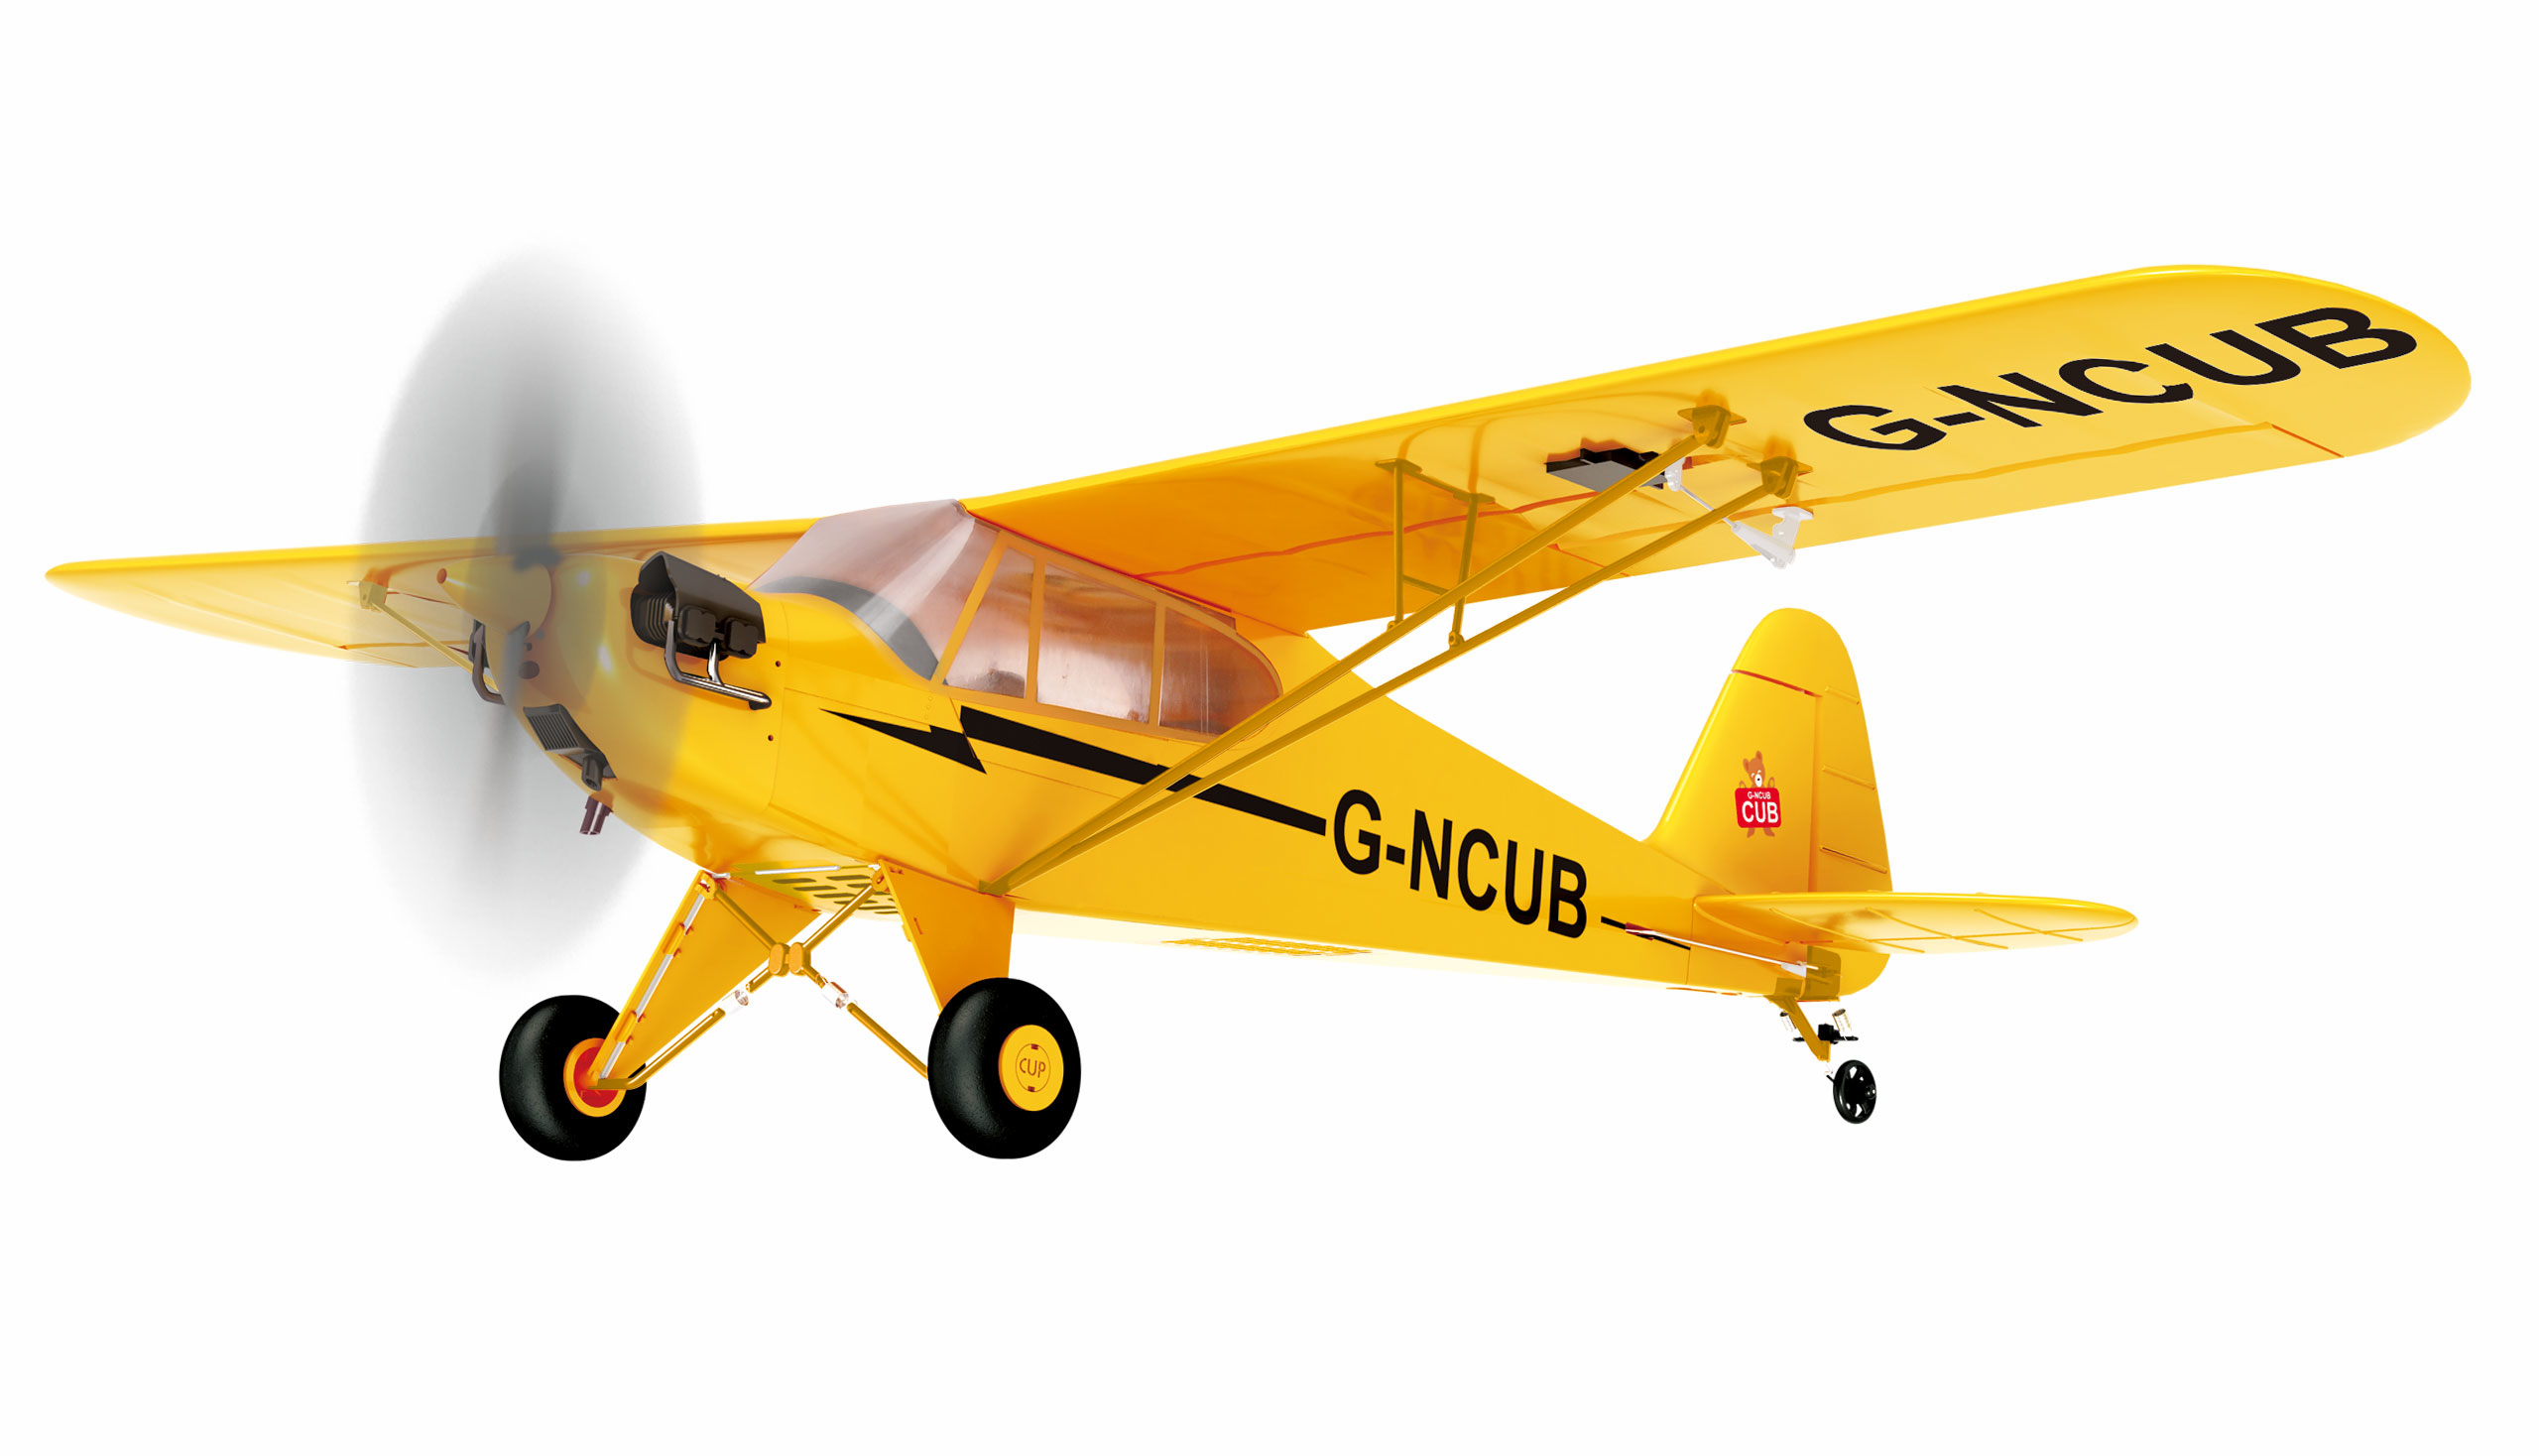 Amewi Skylark - Funkgesteuertes (RC) Flugzeug - Flugbereit (RTF) - Gelb - Elektromotor - Junge/Mädchen - 14 Jahr(e)